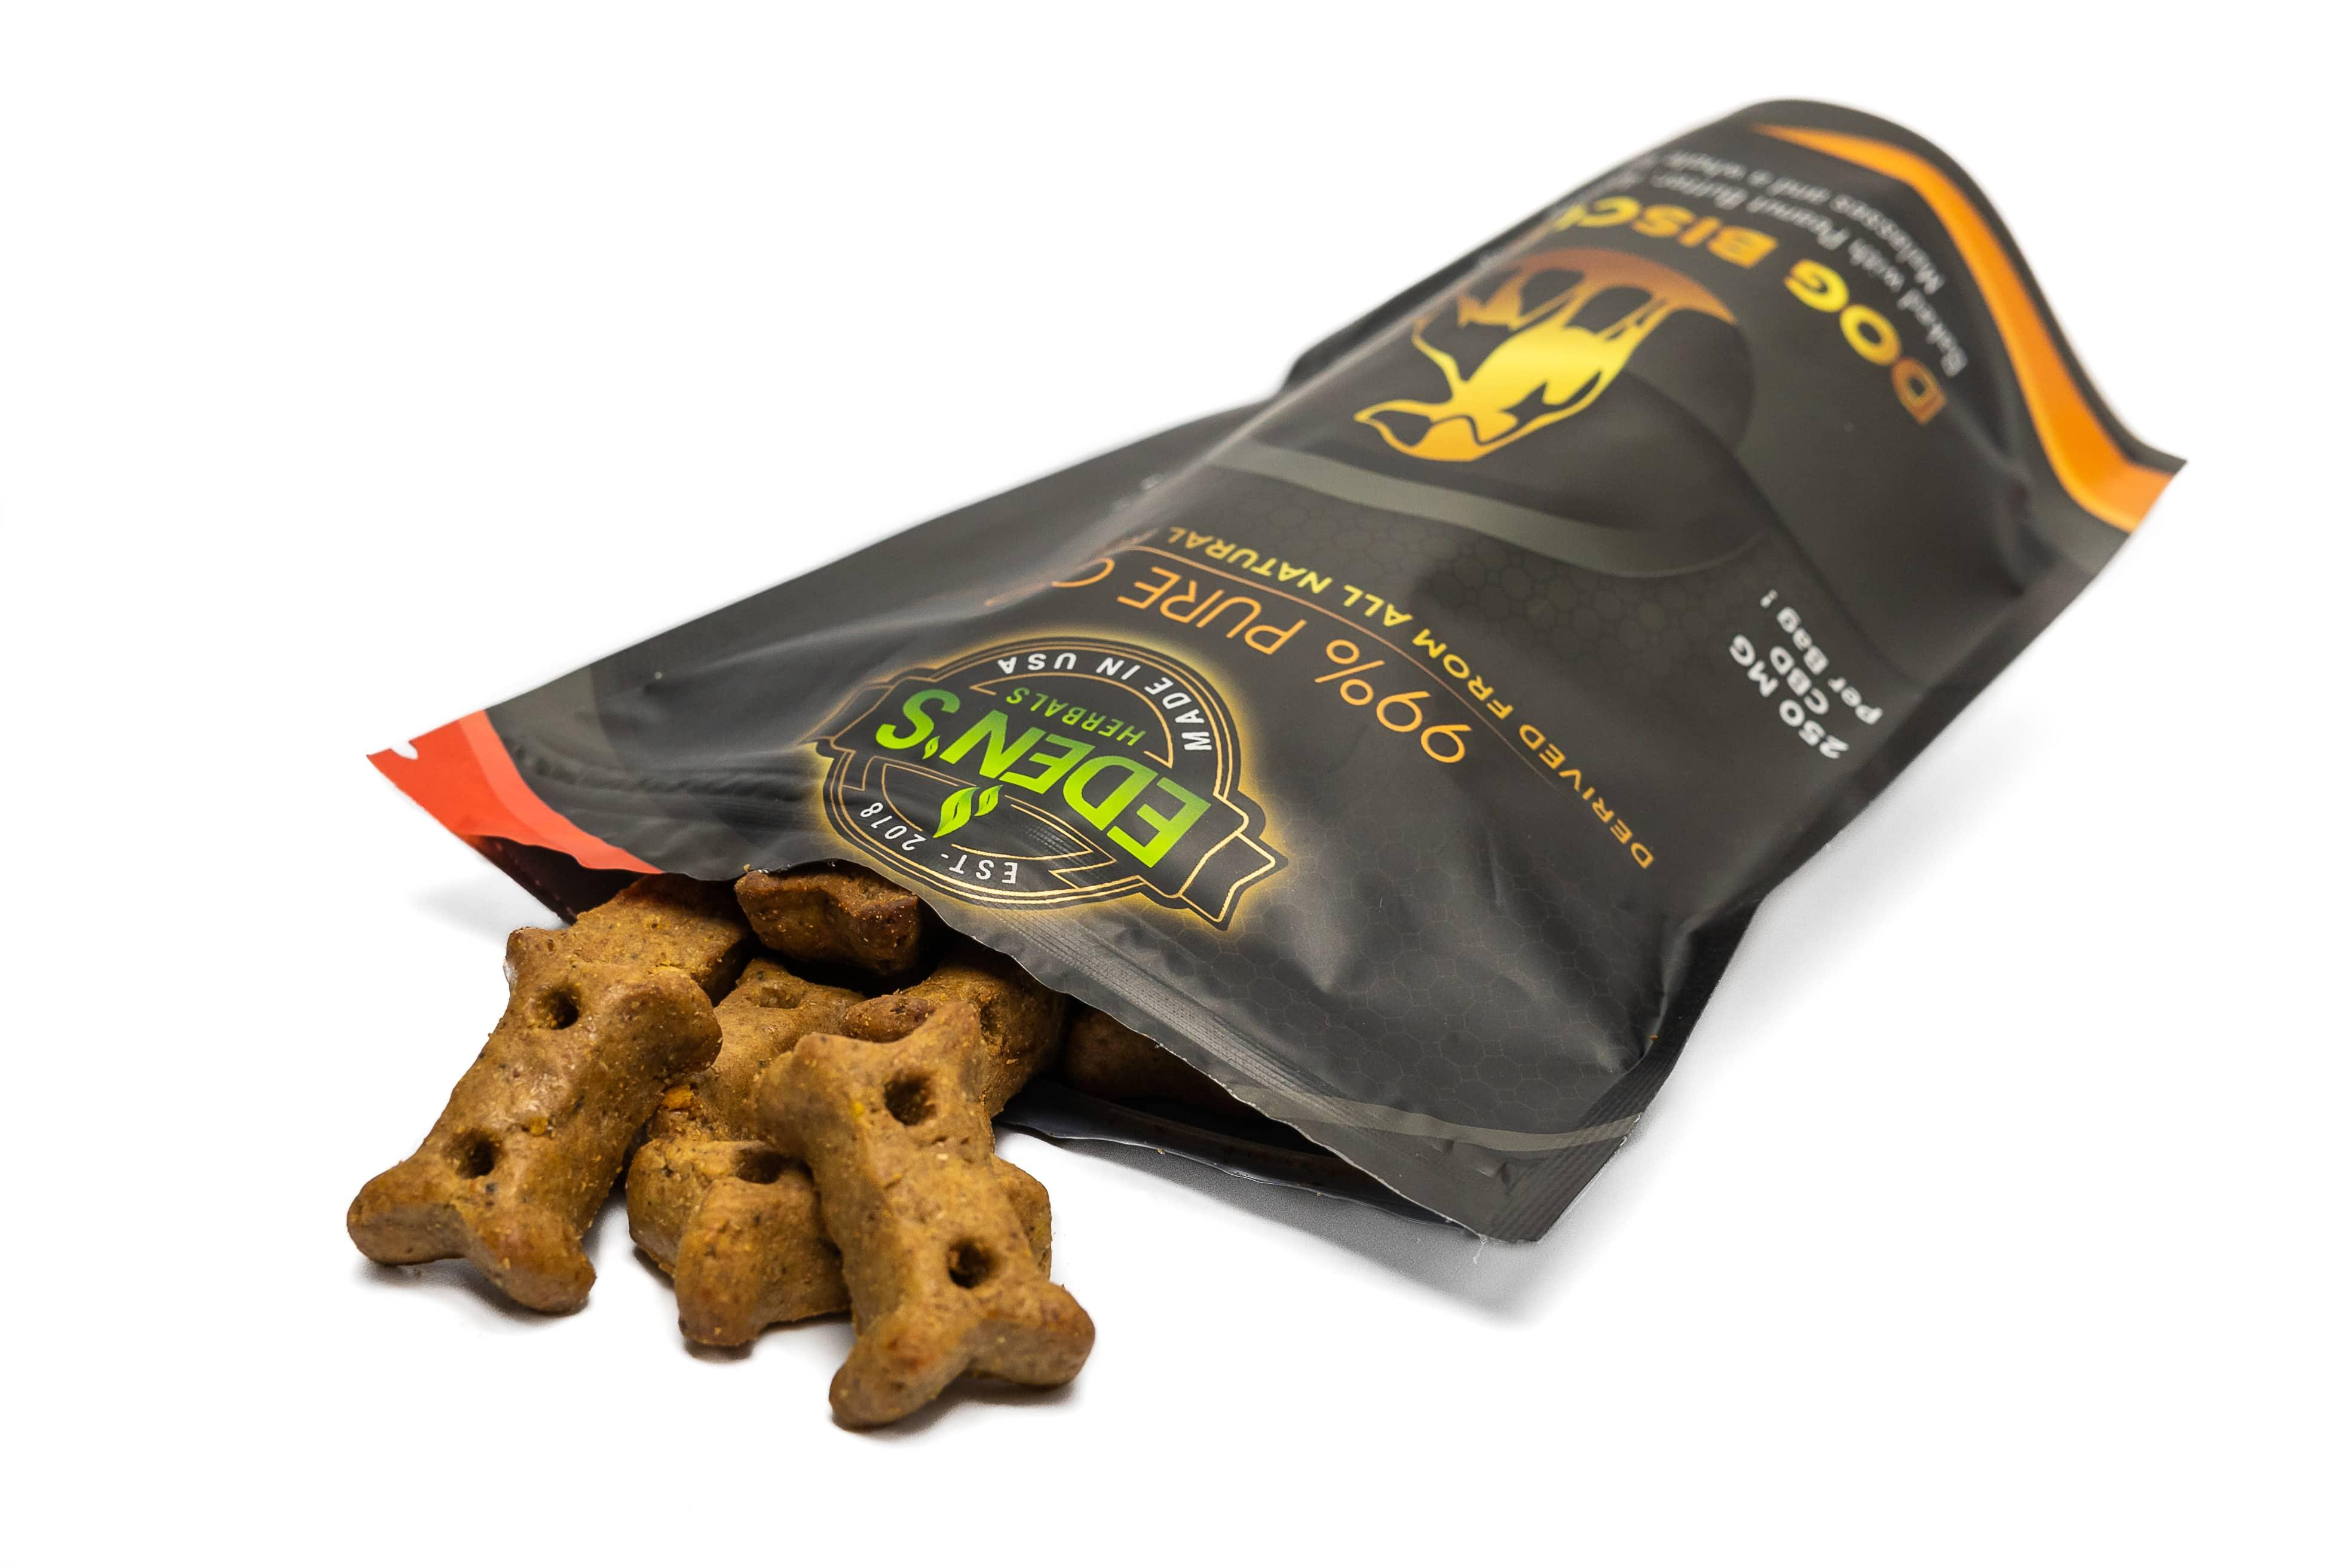 Bag of Eden's Herbals cbd dog treats  against a white background